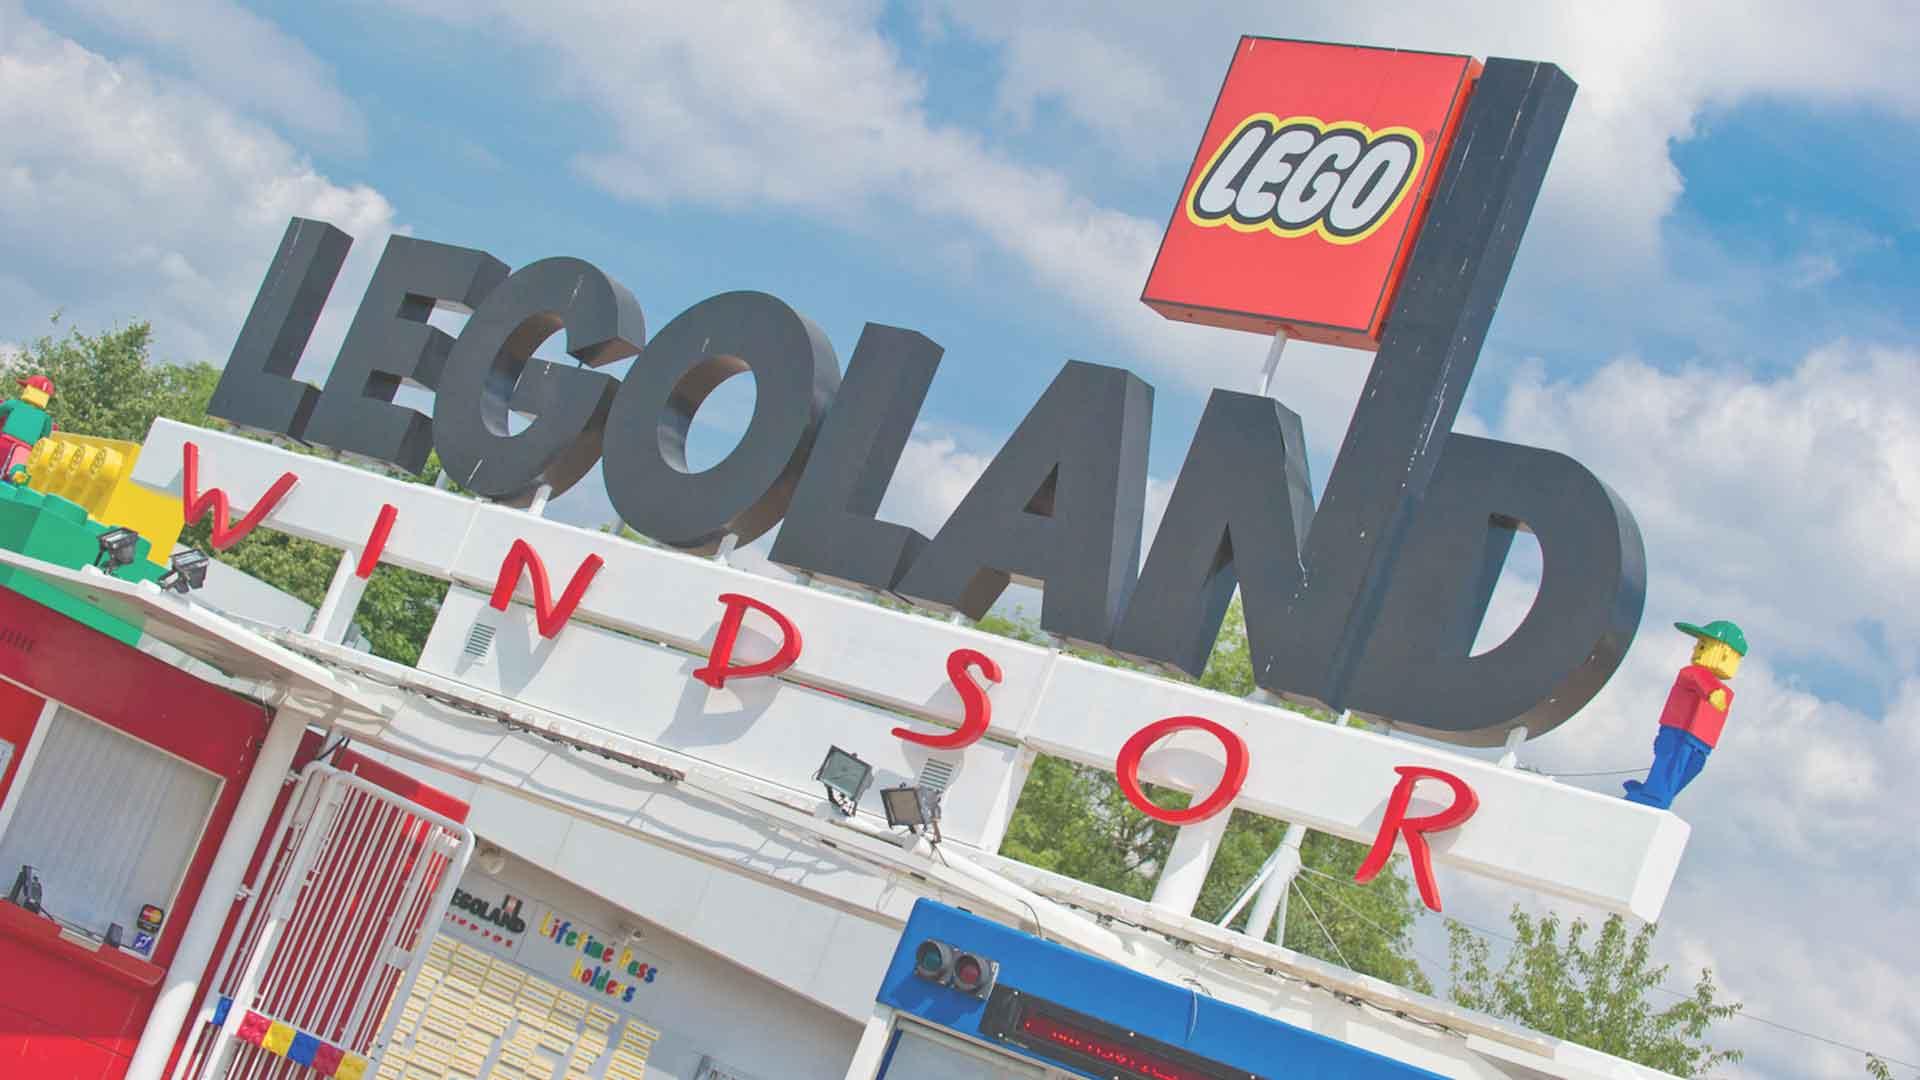 Local attractions Legoland